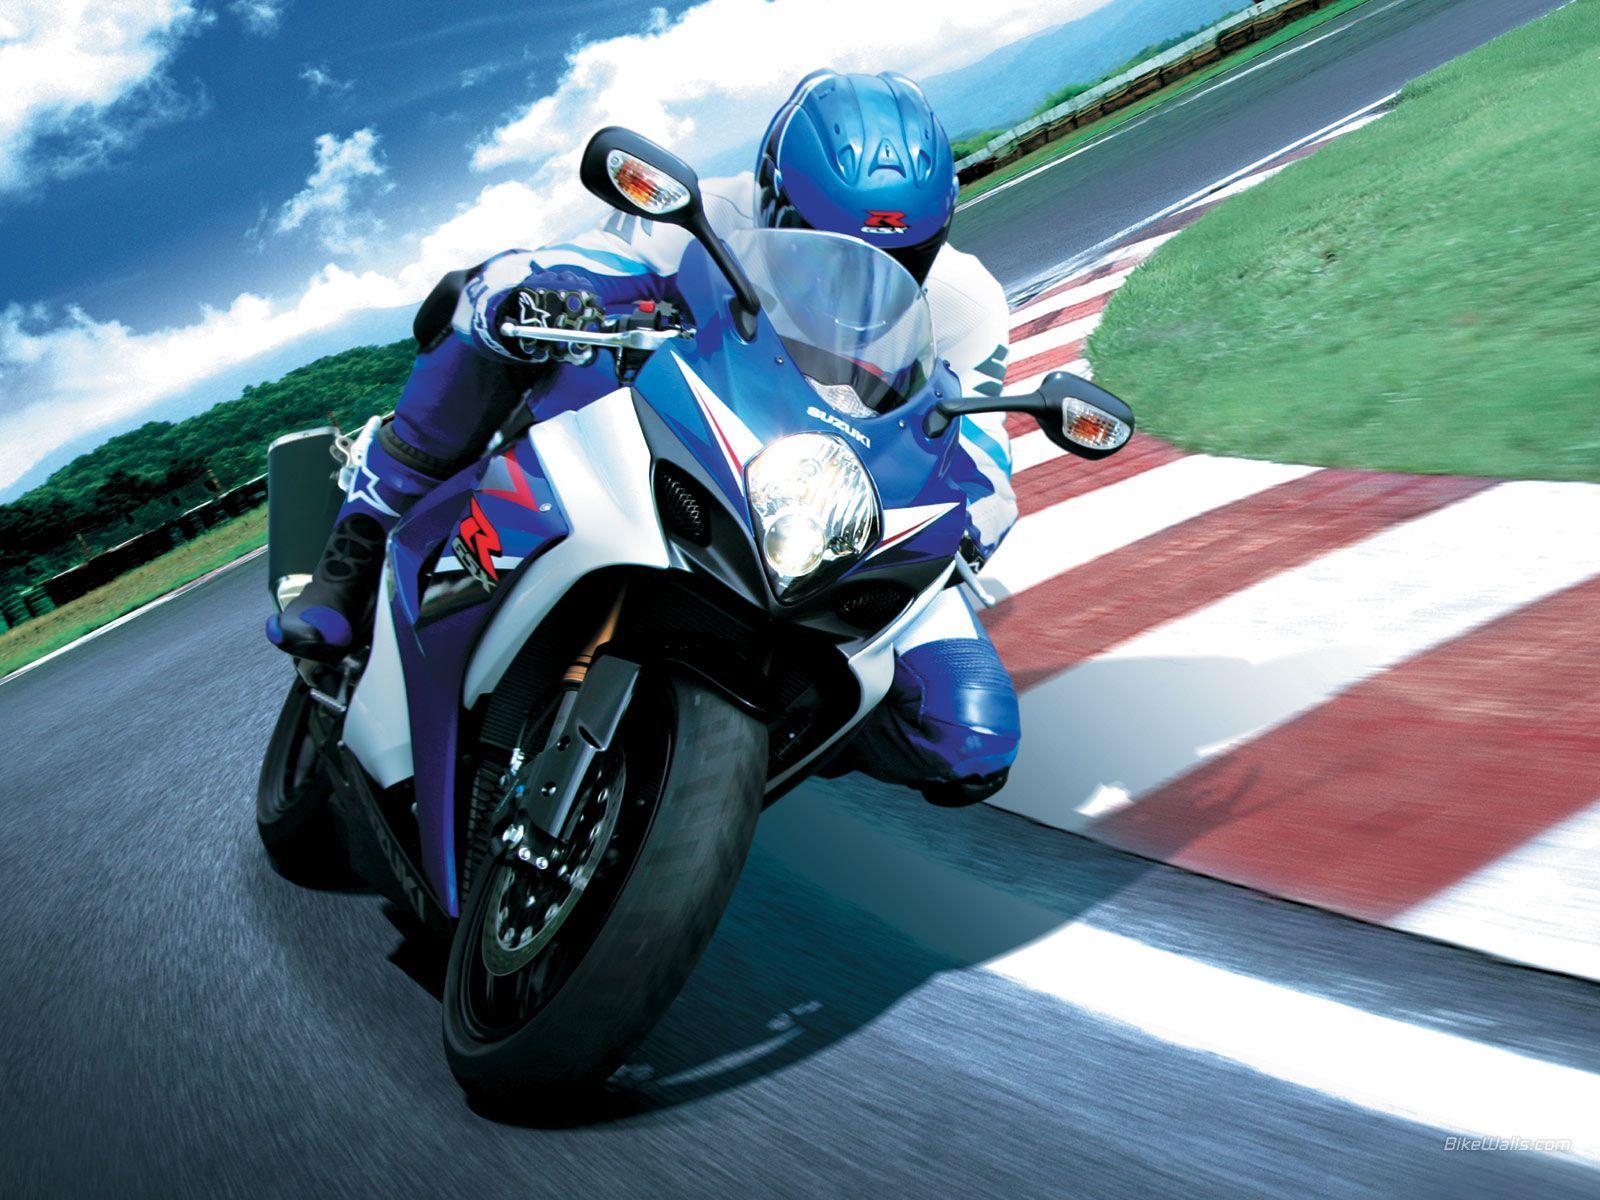 Suzuky Moto Motorcycle Wallpaper Suzuki Bikes Suzuki Motorcycle